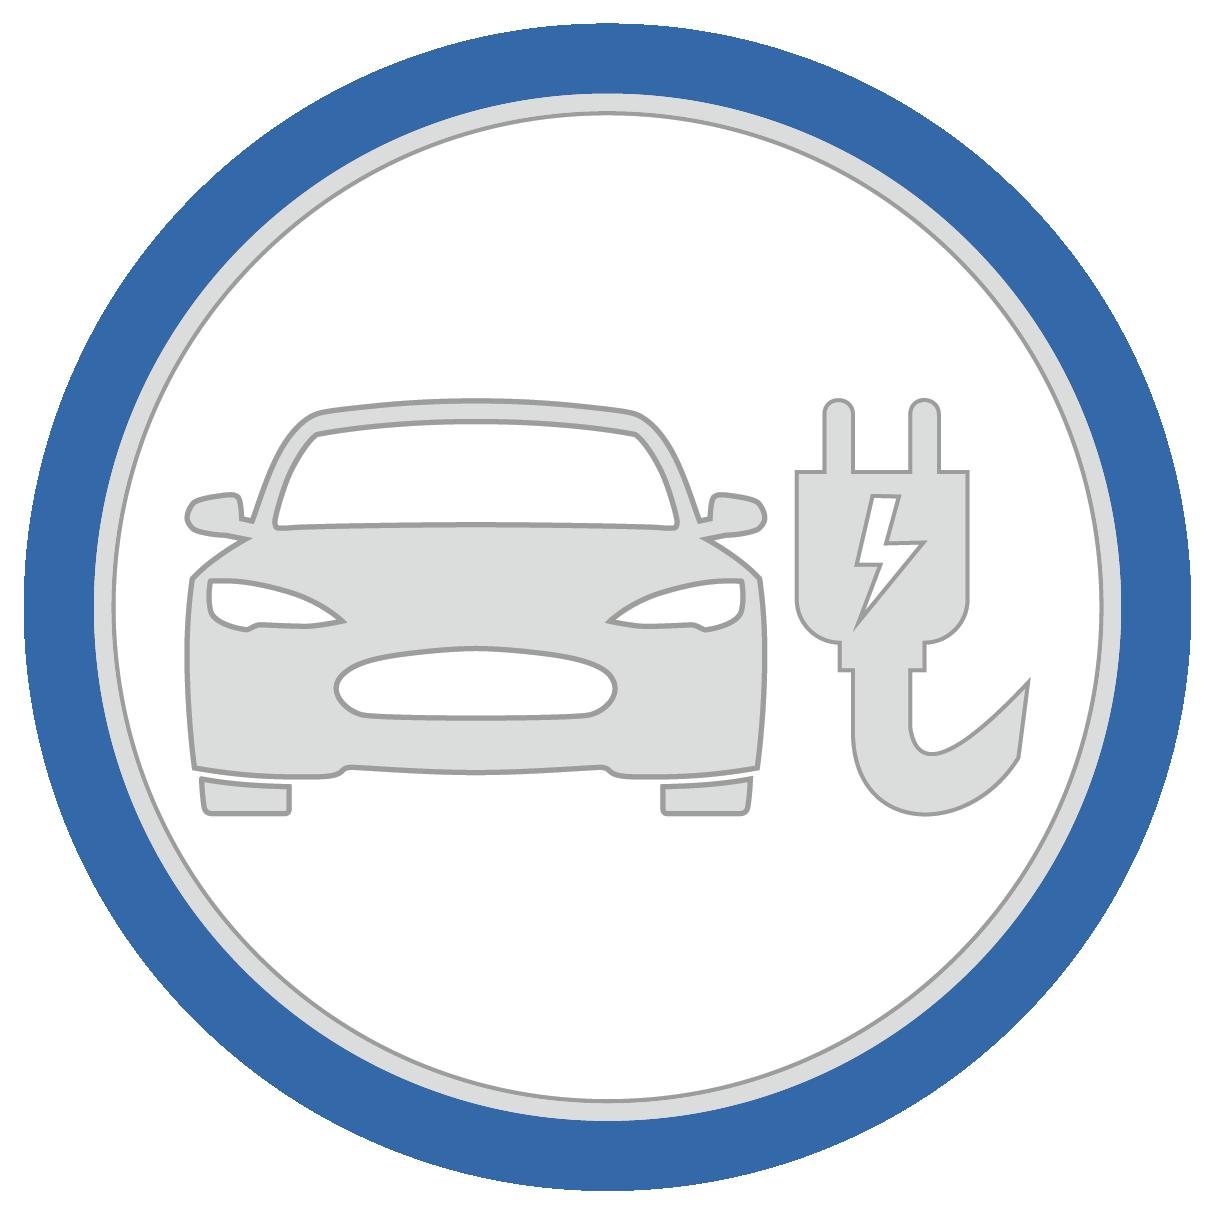 Carregamento Carros